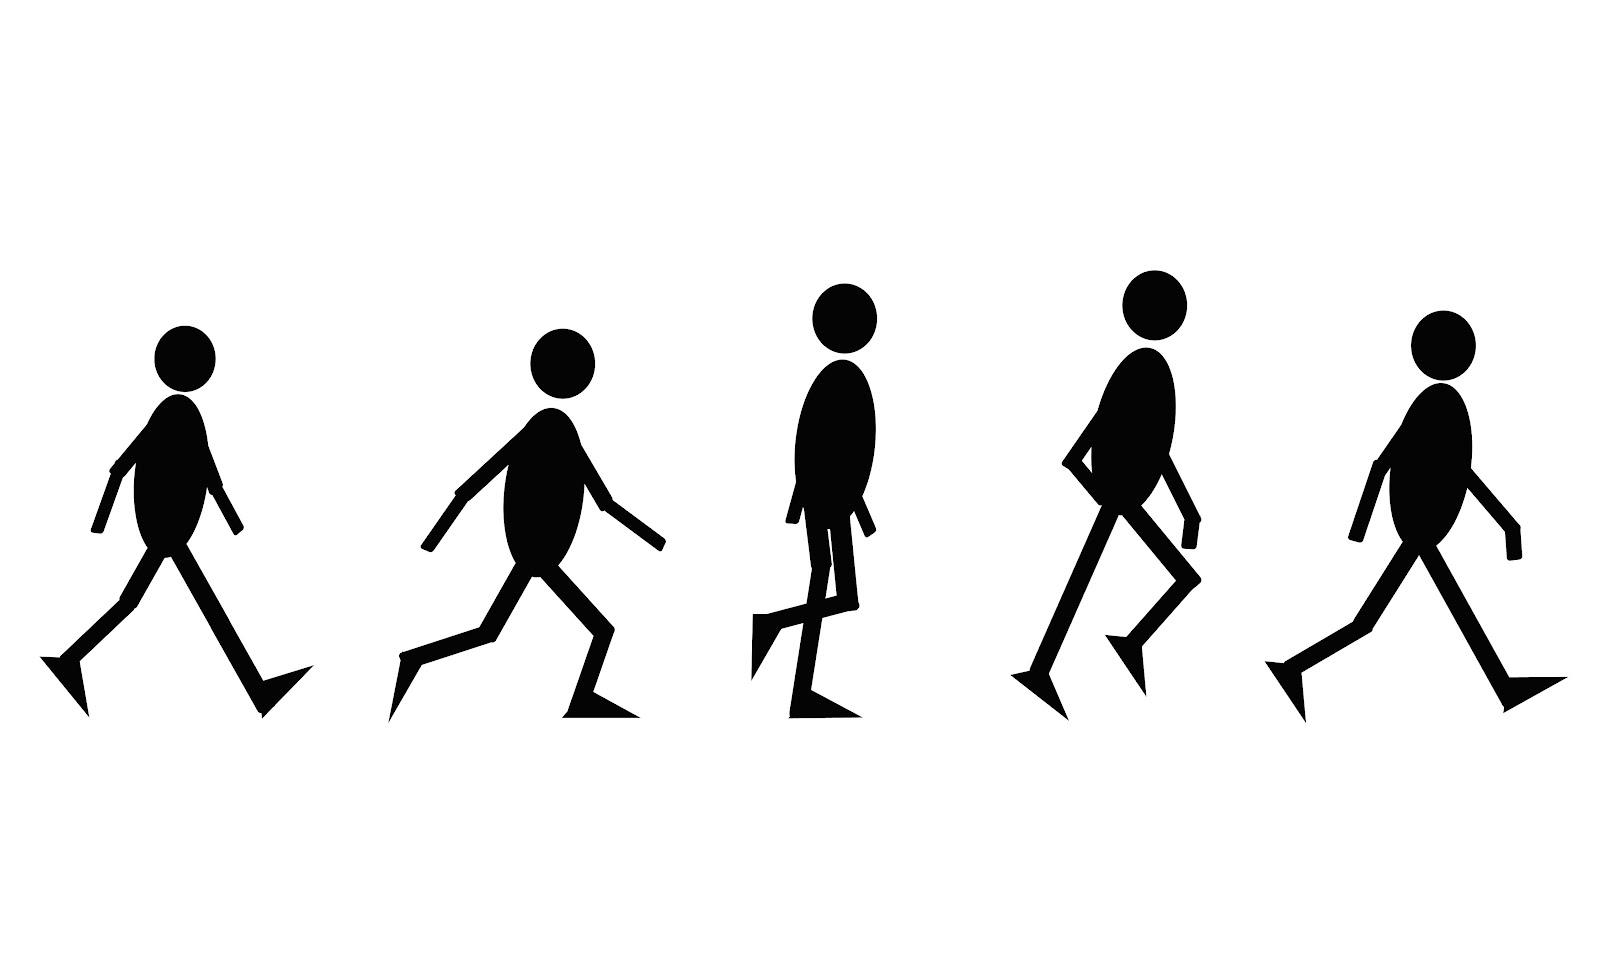 Walking Animation Steps